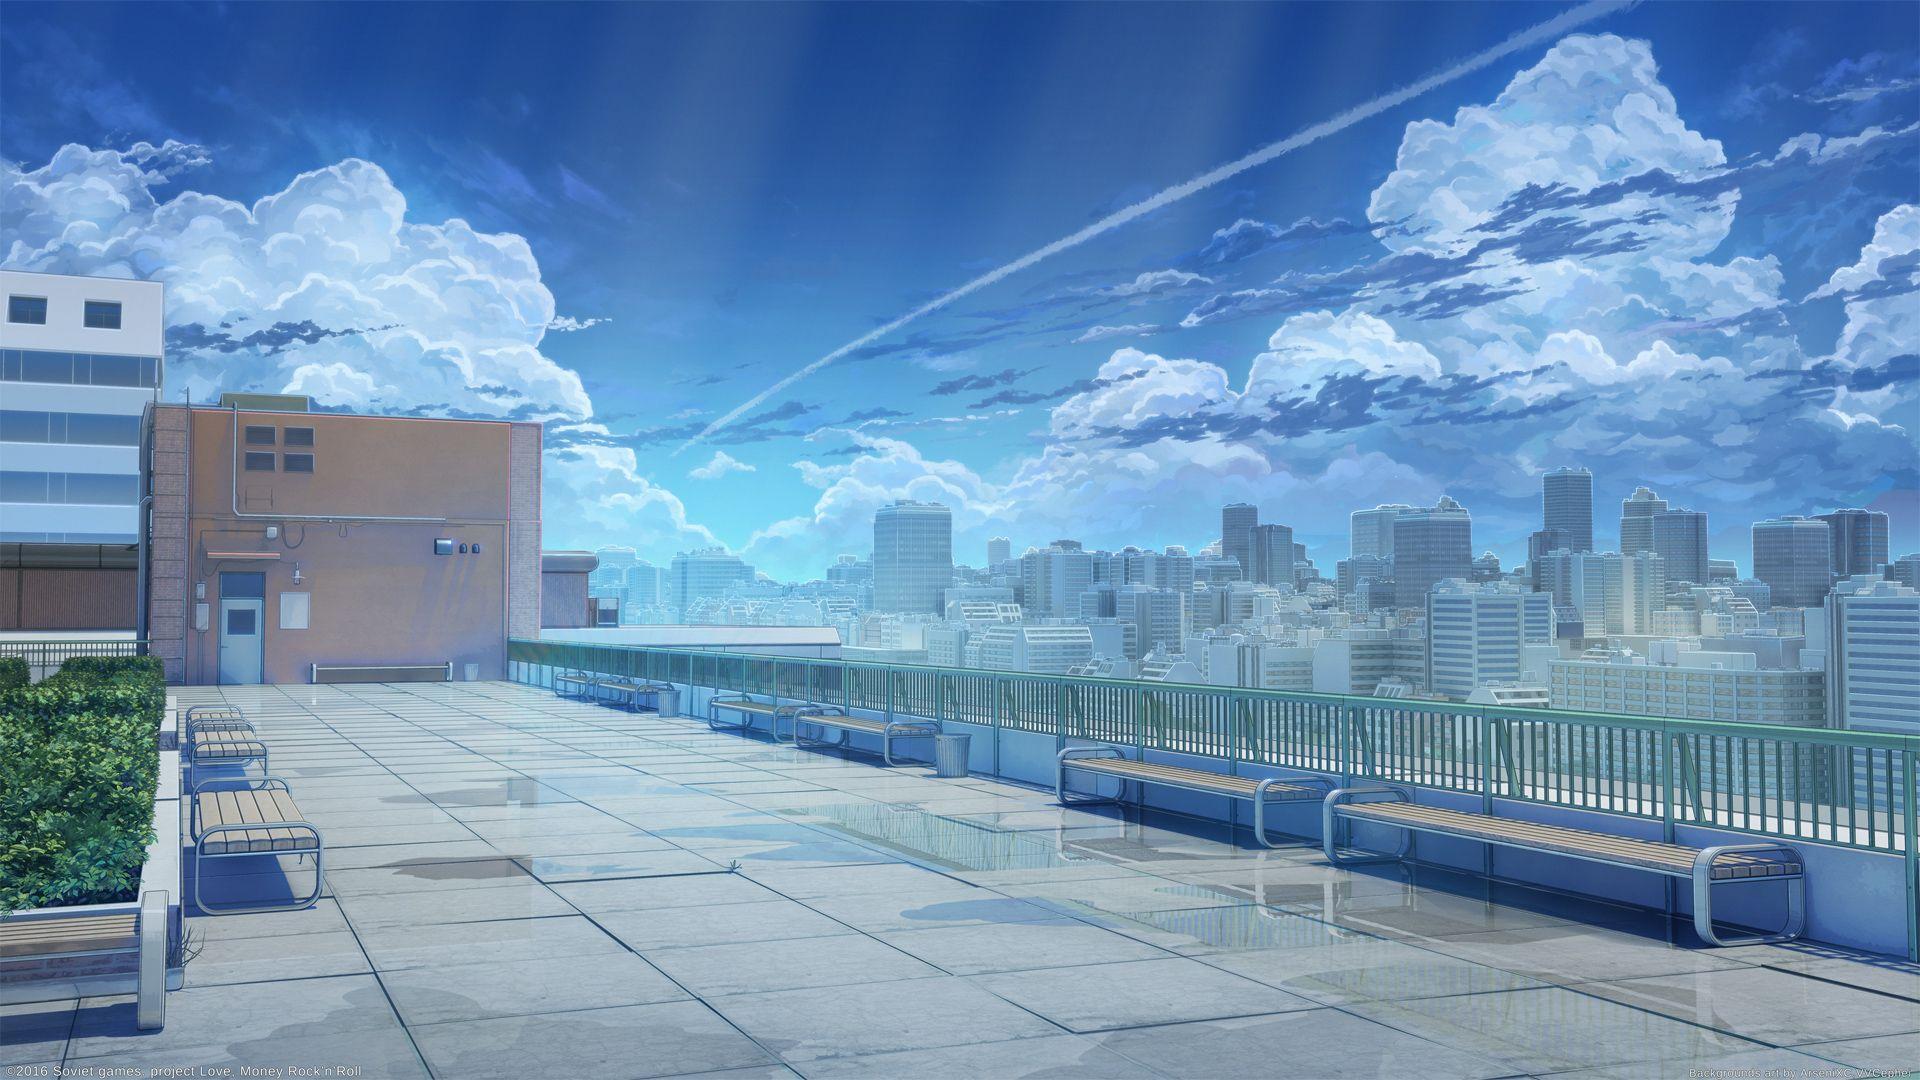 School Rooftop By Arsenixc Anime Scenery Anime Scenery Wallpaper Anime Art Beautiful